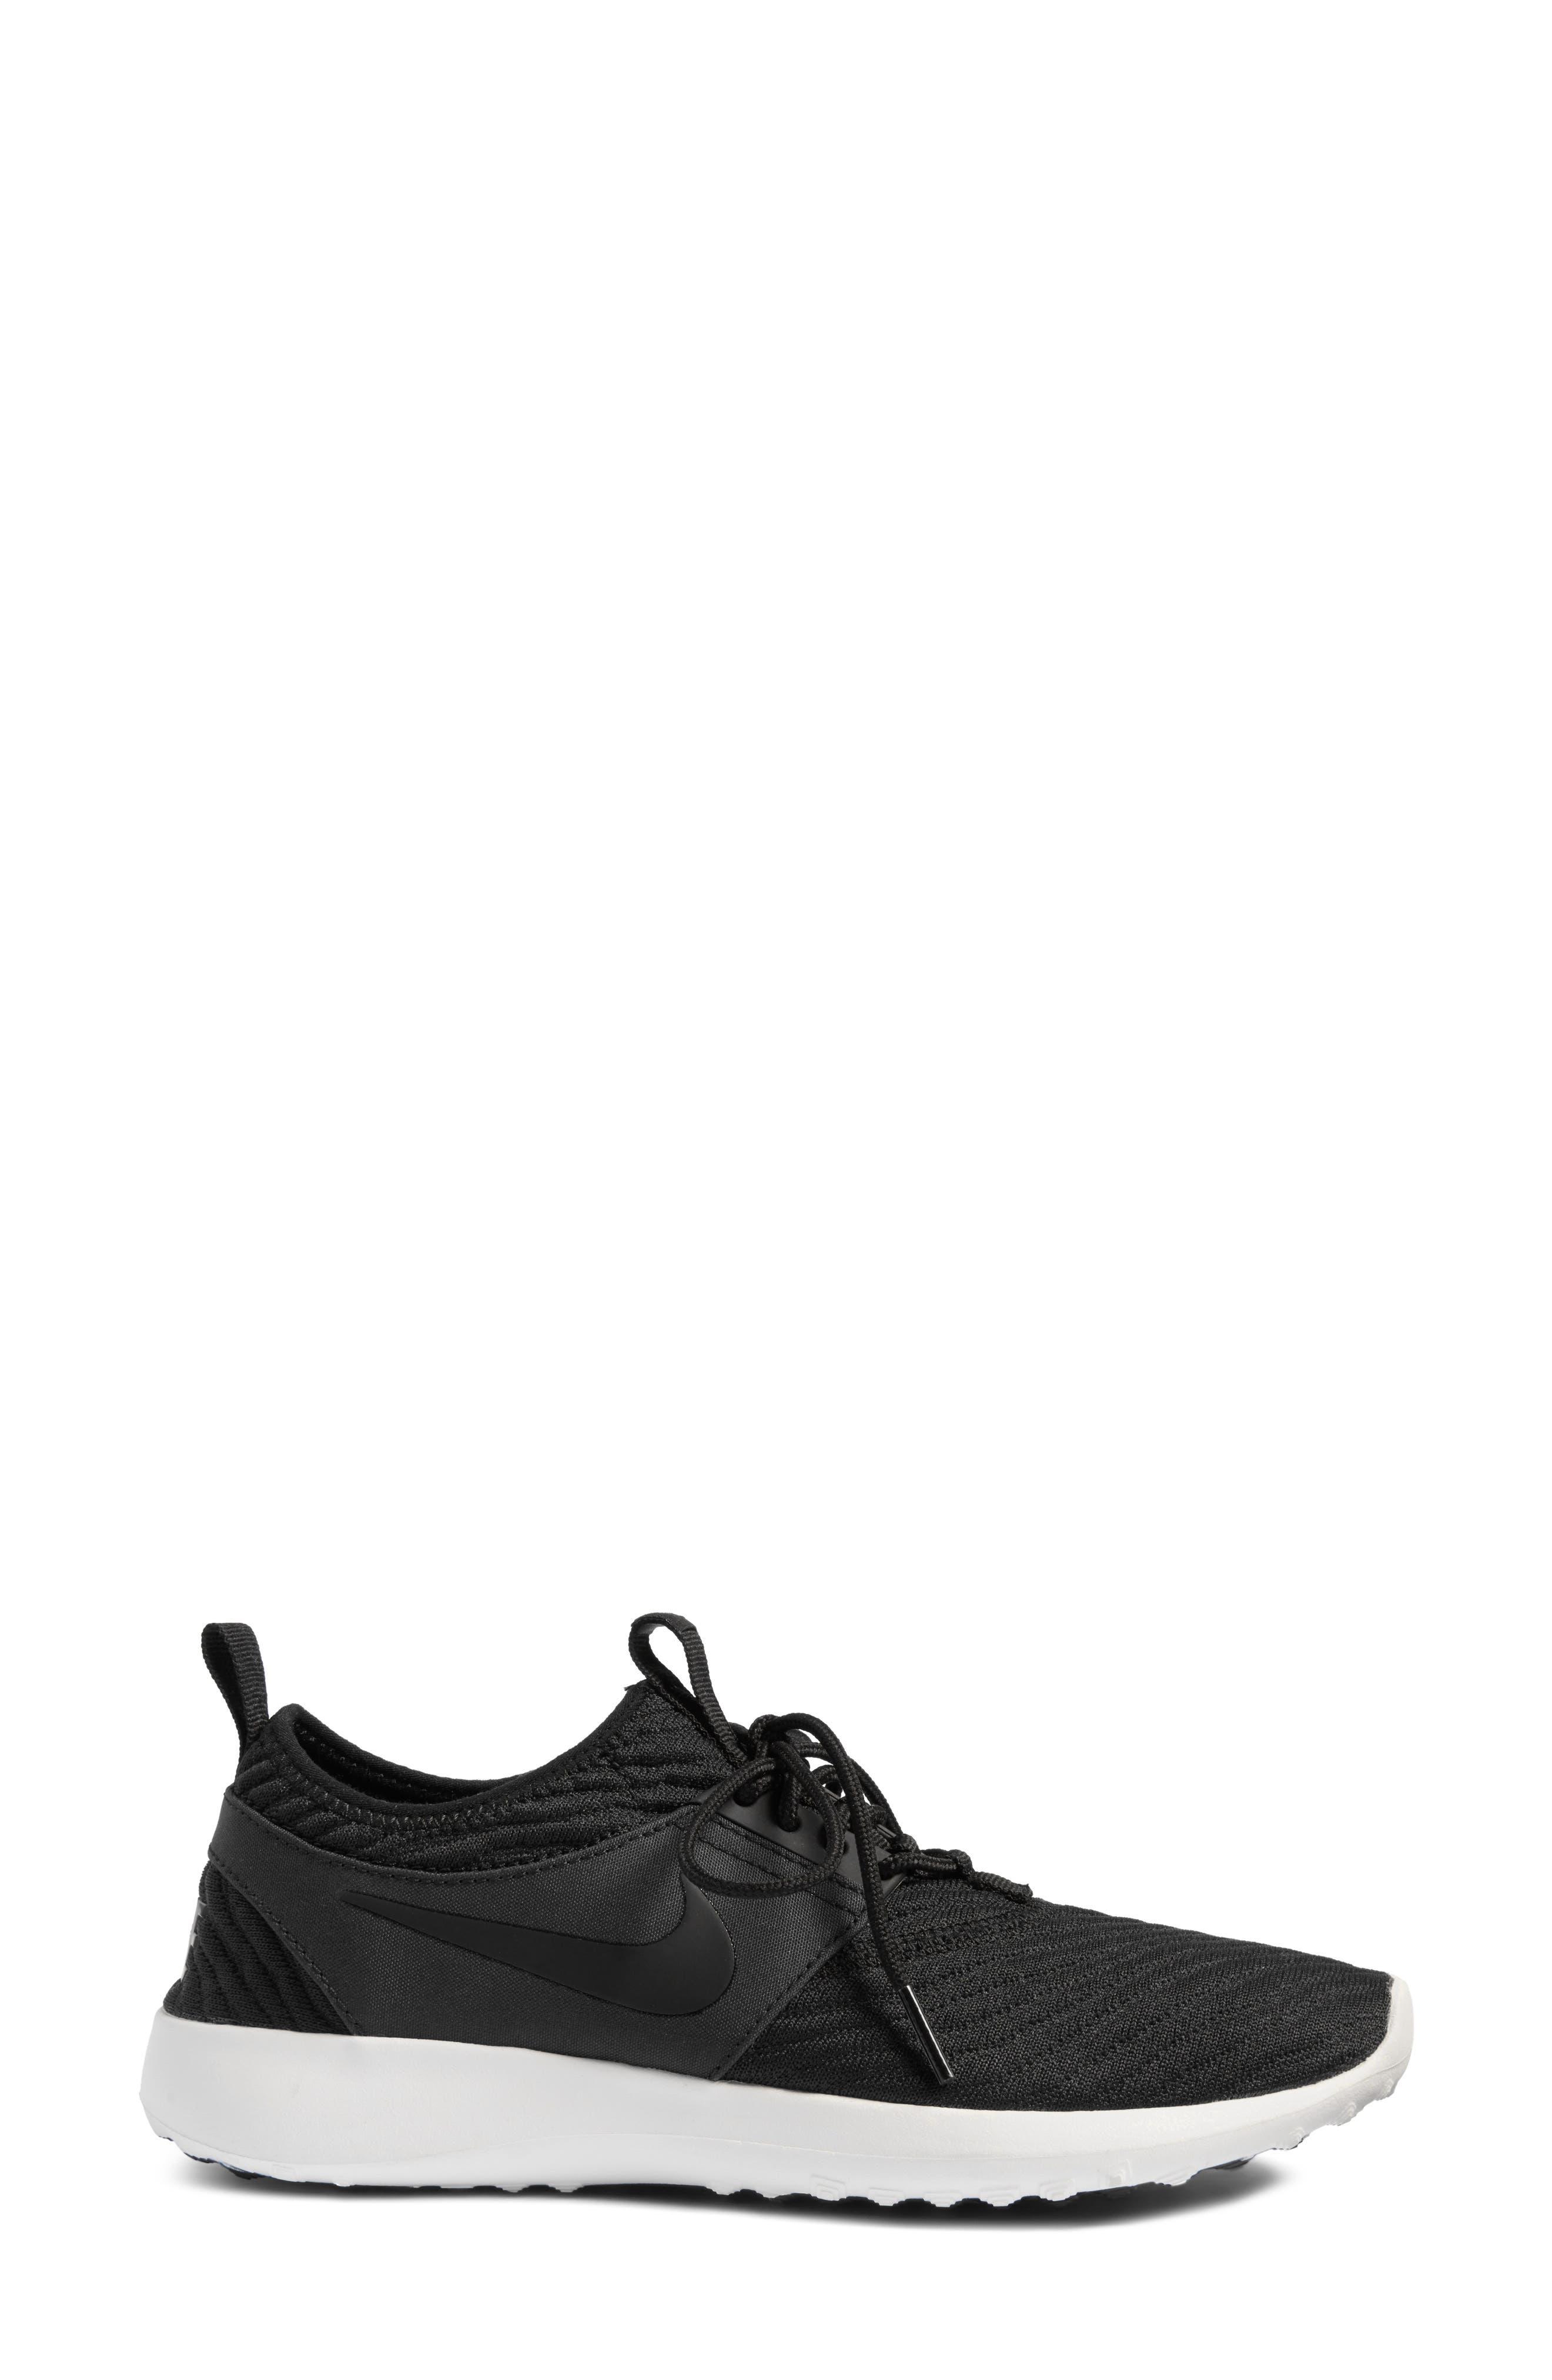 Juvenate SE Sneaker,                             Alternate thumbnail 27, color,